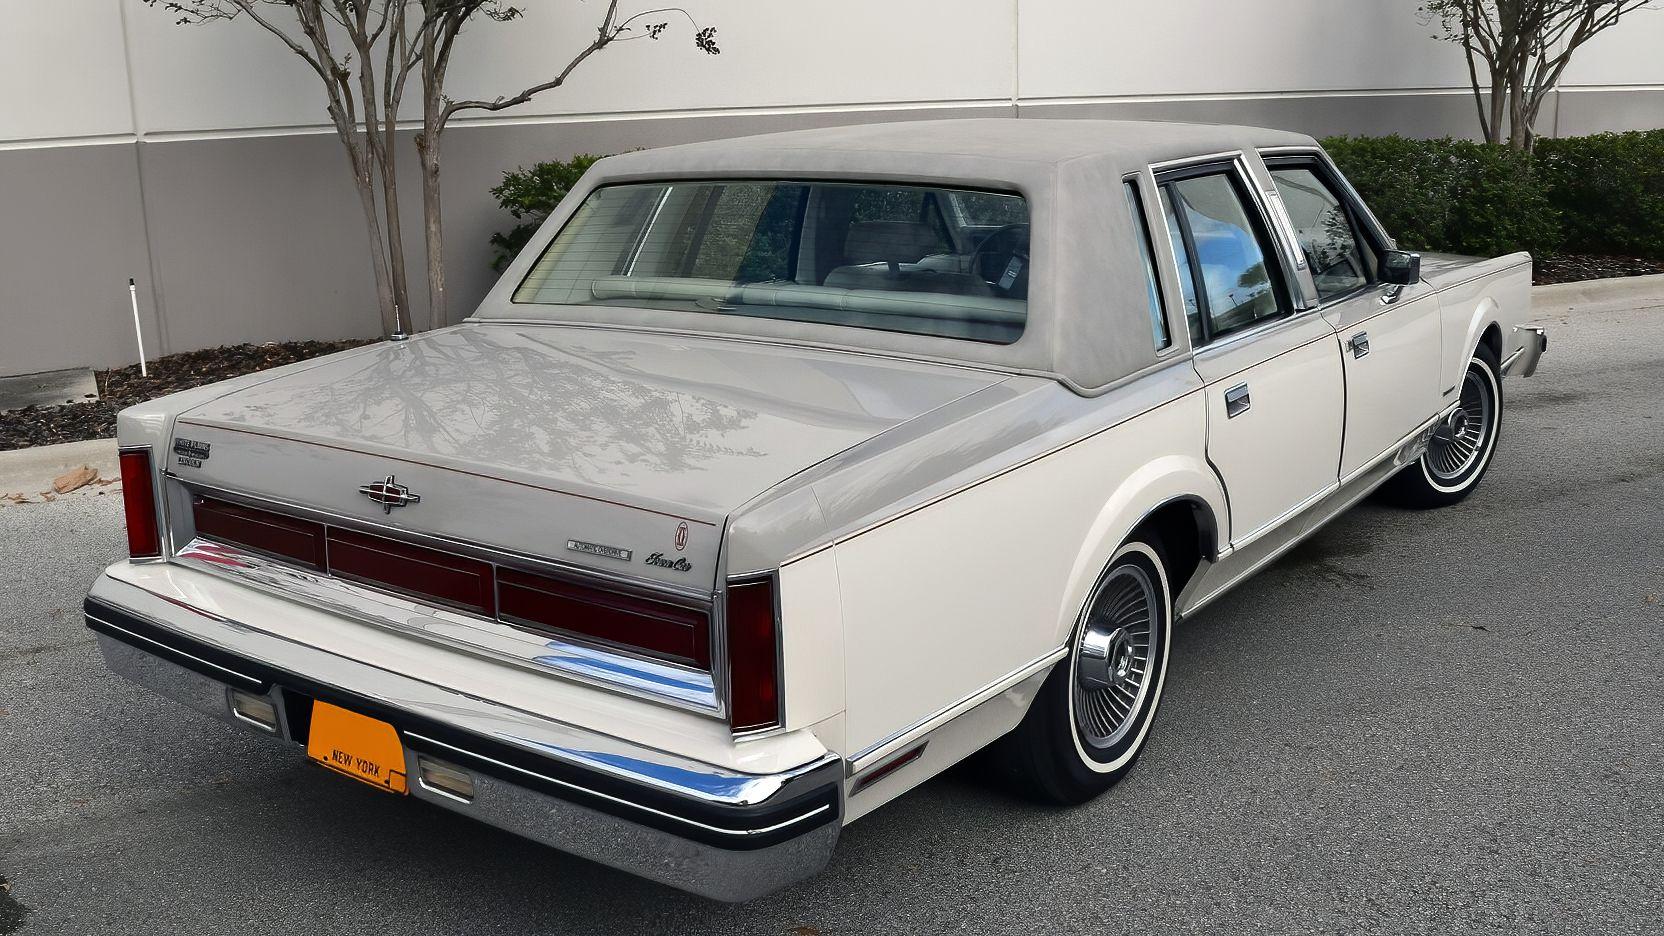 1982 Lincoln Town Car in 2020 Fabrieken